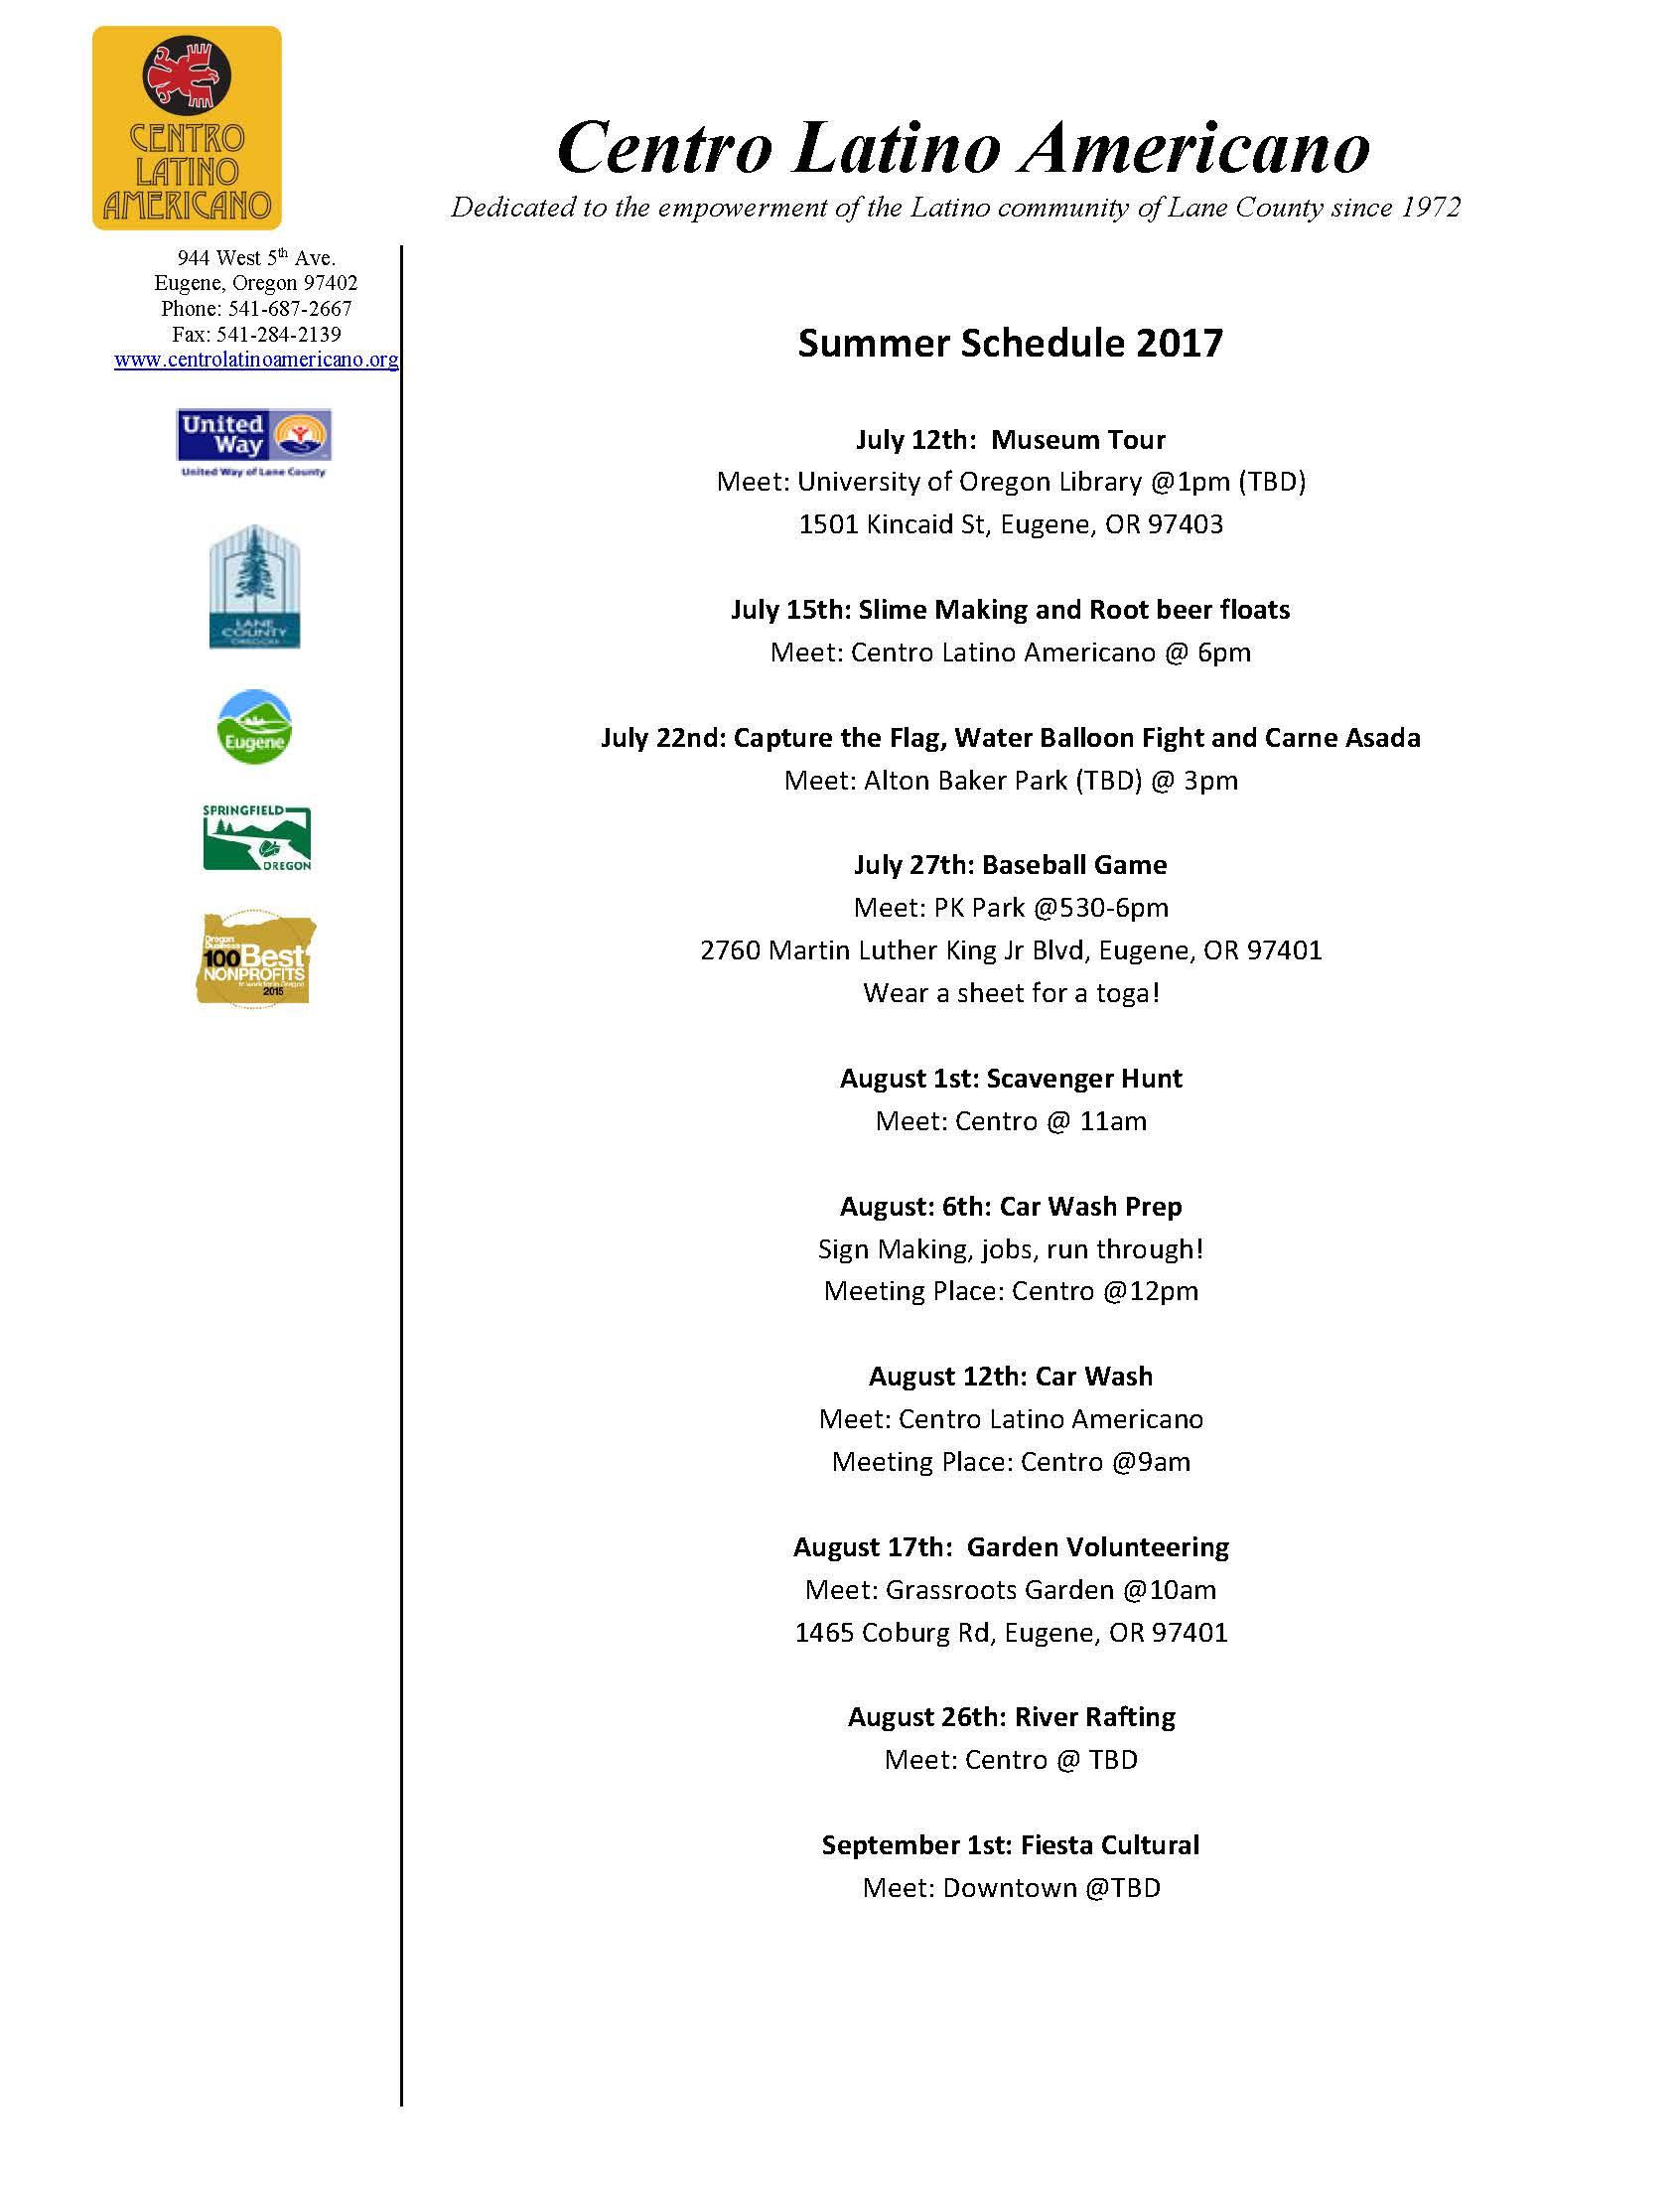 Centro Latino Americano Mentoring Summer Session 2017